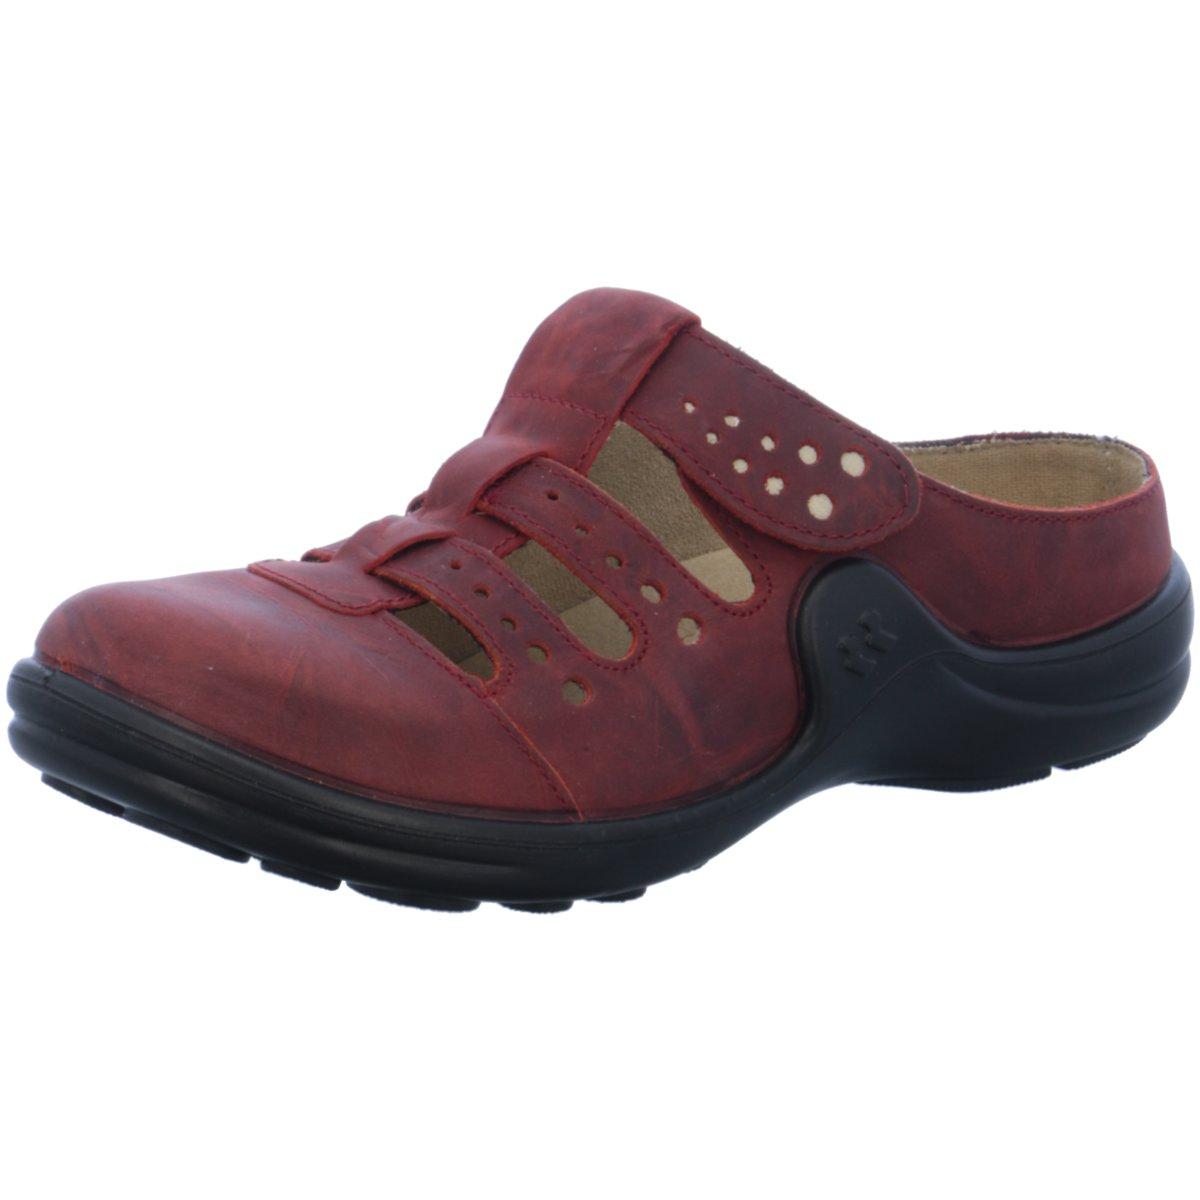 Romika Damen Pantoletten NV 400 400 301779 | Rabatt rot